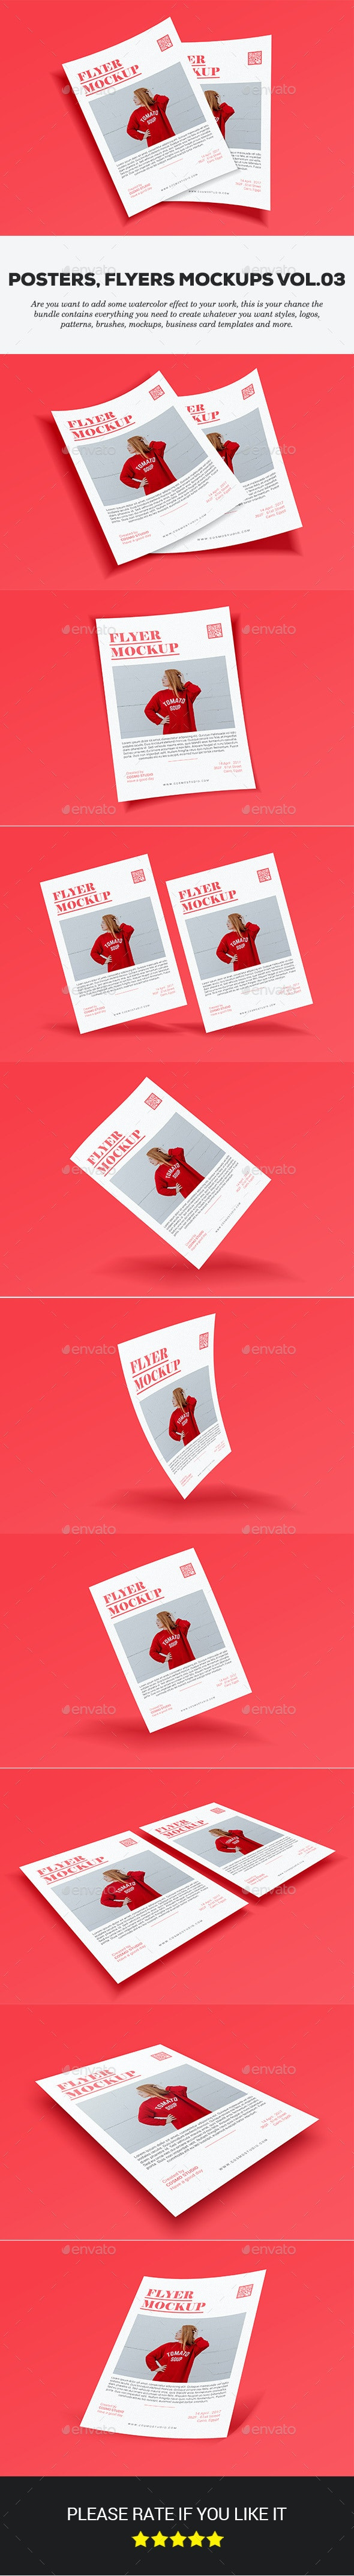 Posters & Flyers Mockups Vol.3 - Product Mock-Ups Graphics